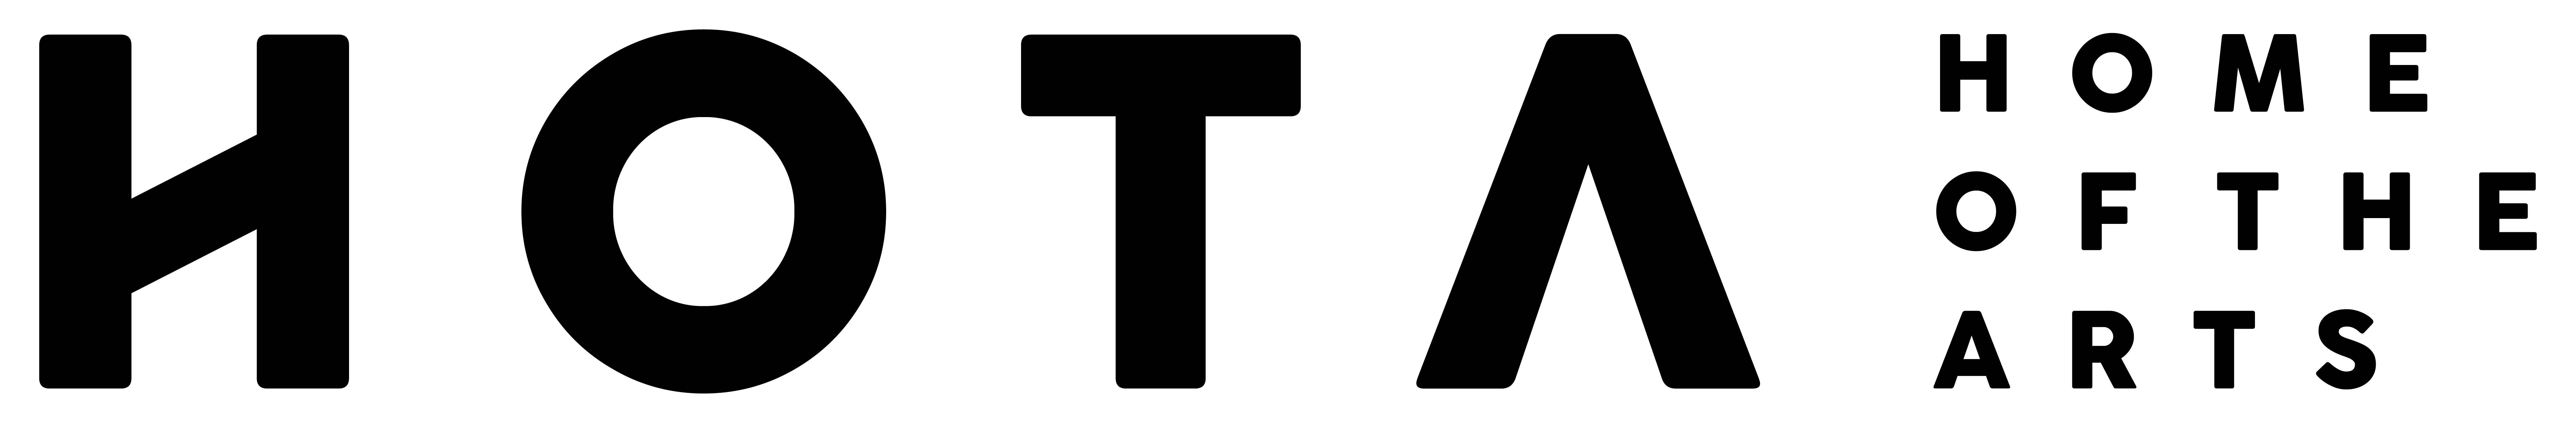 HOTA_Logo_Version-1_Black.png?mtime=20190711144431#asset:2303